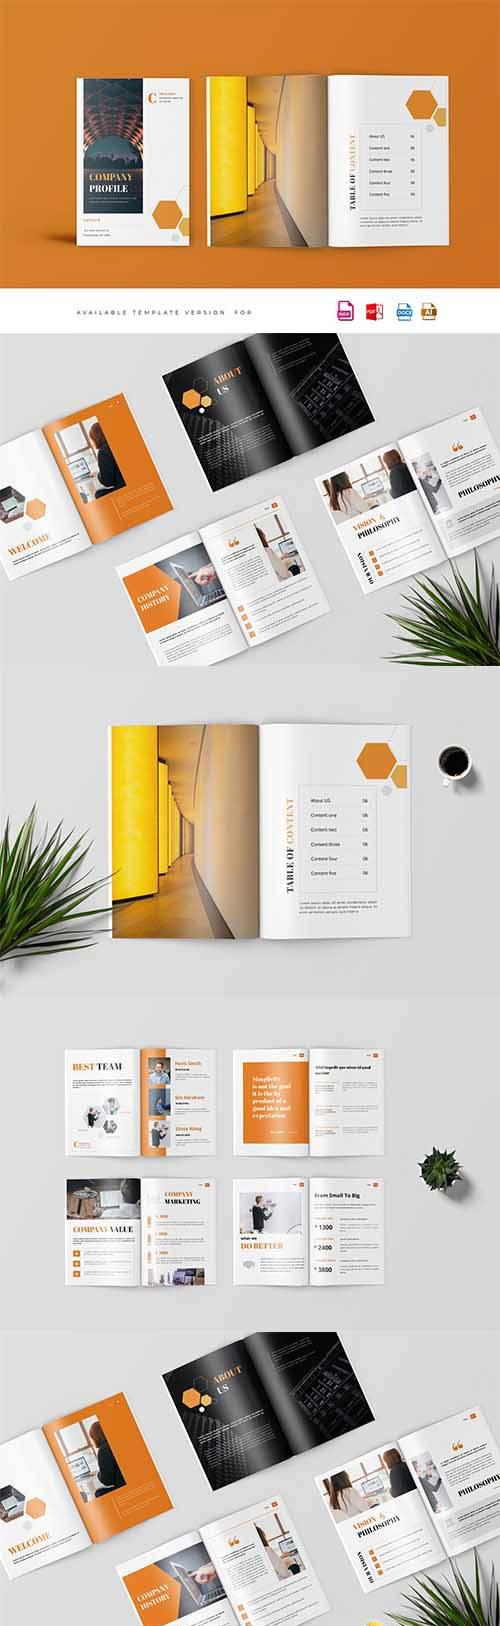 黄色系公司介绍A4画册ID模板 Company Proposal Template插图